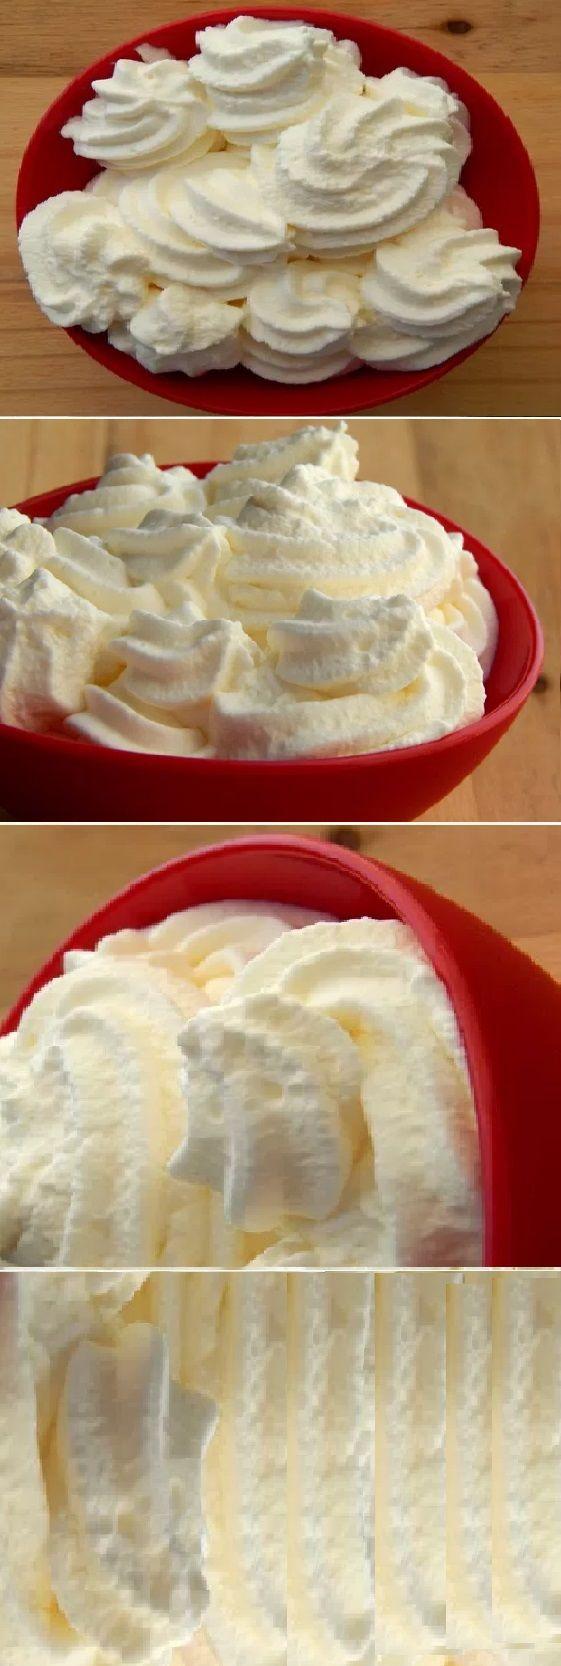 Cómo hacer chantilly casero con crema de leche. #chantilly #crema #buttercream #cremadeleche #leche #cremachantilly #mangapastelera #boquillas #cupcakes #postres #receta #recipe #casero #torta #tartas #pastel #nestlecocina #bizcocho #bizcochuelo #tasty #cocina #chocolate #pan #panes Si te gusta dinos HOLA y dale a Me Gusta MIREN …